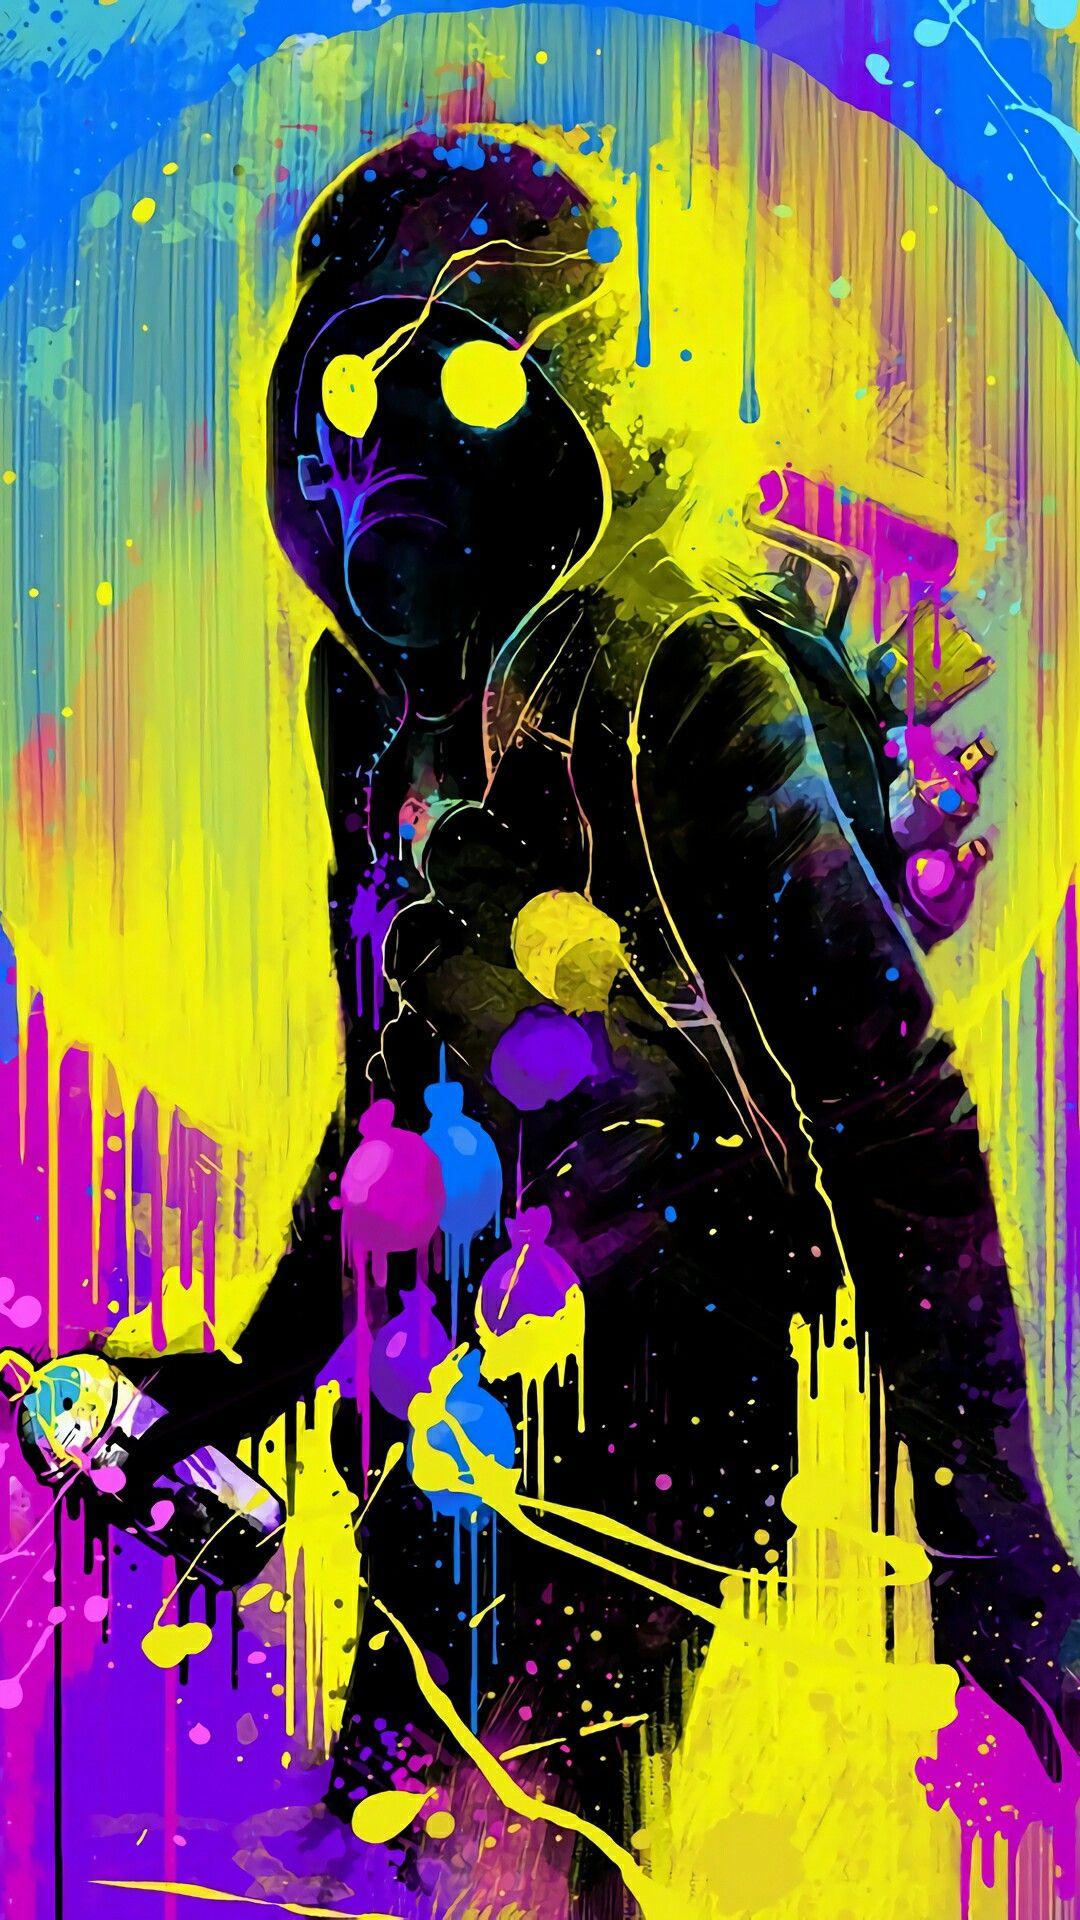 Pin by 昱辰 劉 on Sprays in 2019 | Graffiti wallpaper, Art, Gas mask art